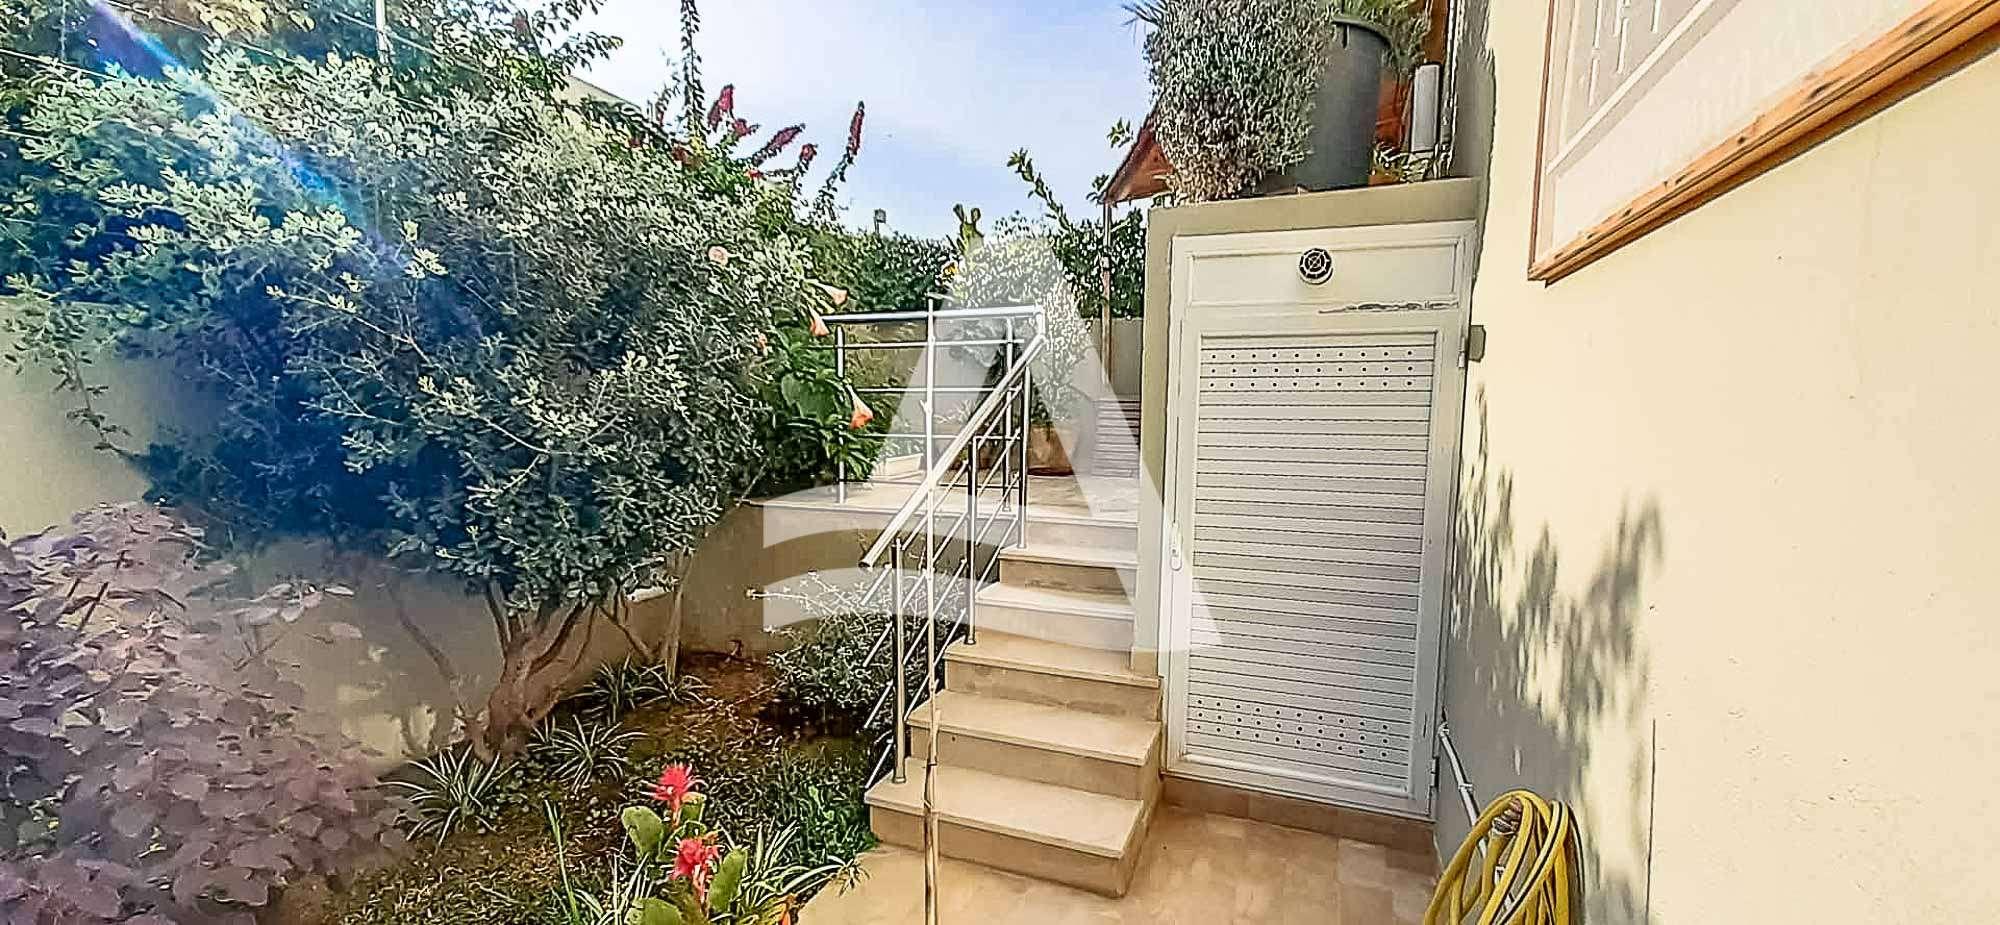 httpss3.amazonaws.comlogimoaws_Arcane_immobilière_la_Marsa-_location_-_vente_la_marsa_8_sur_12_1574441790501